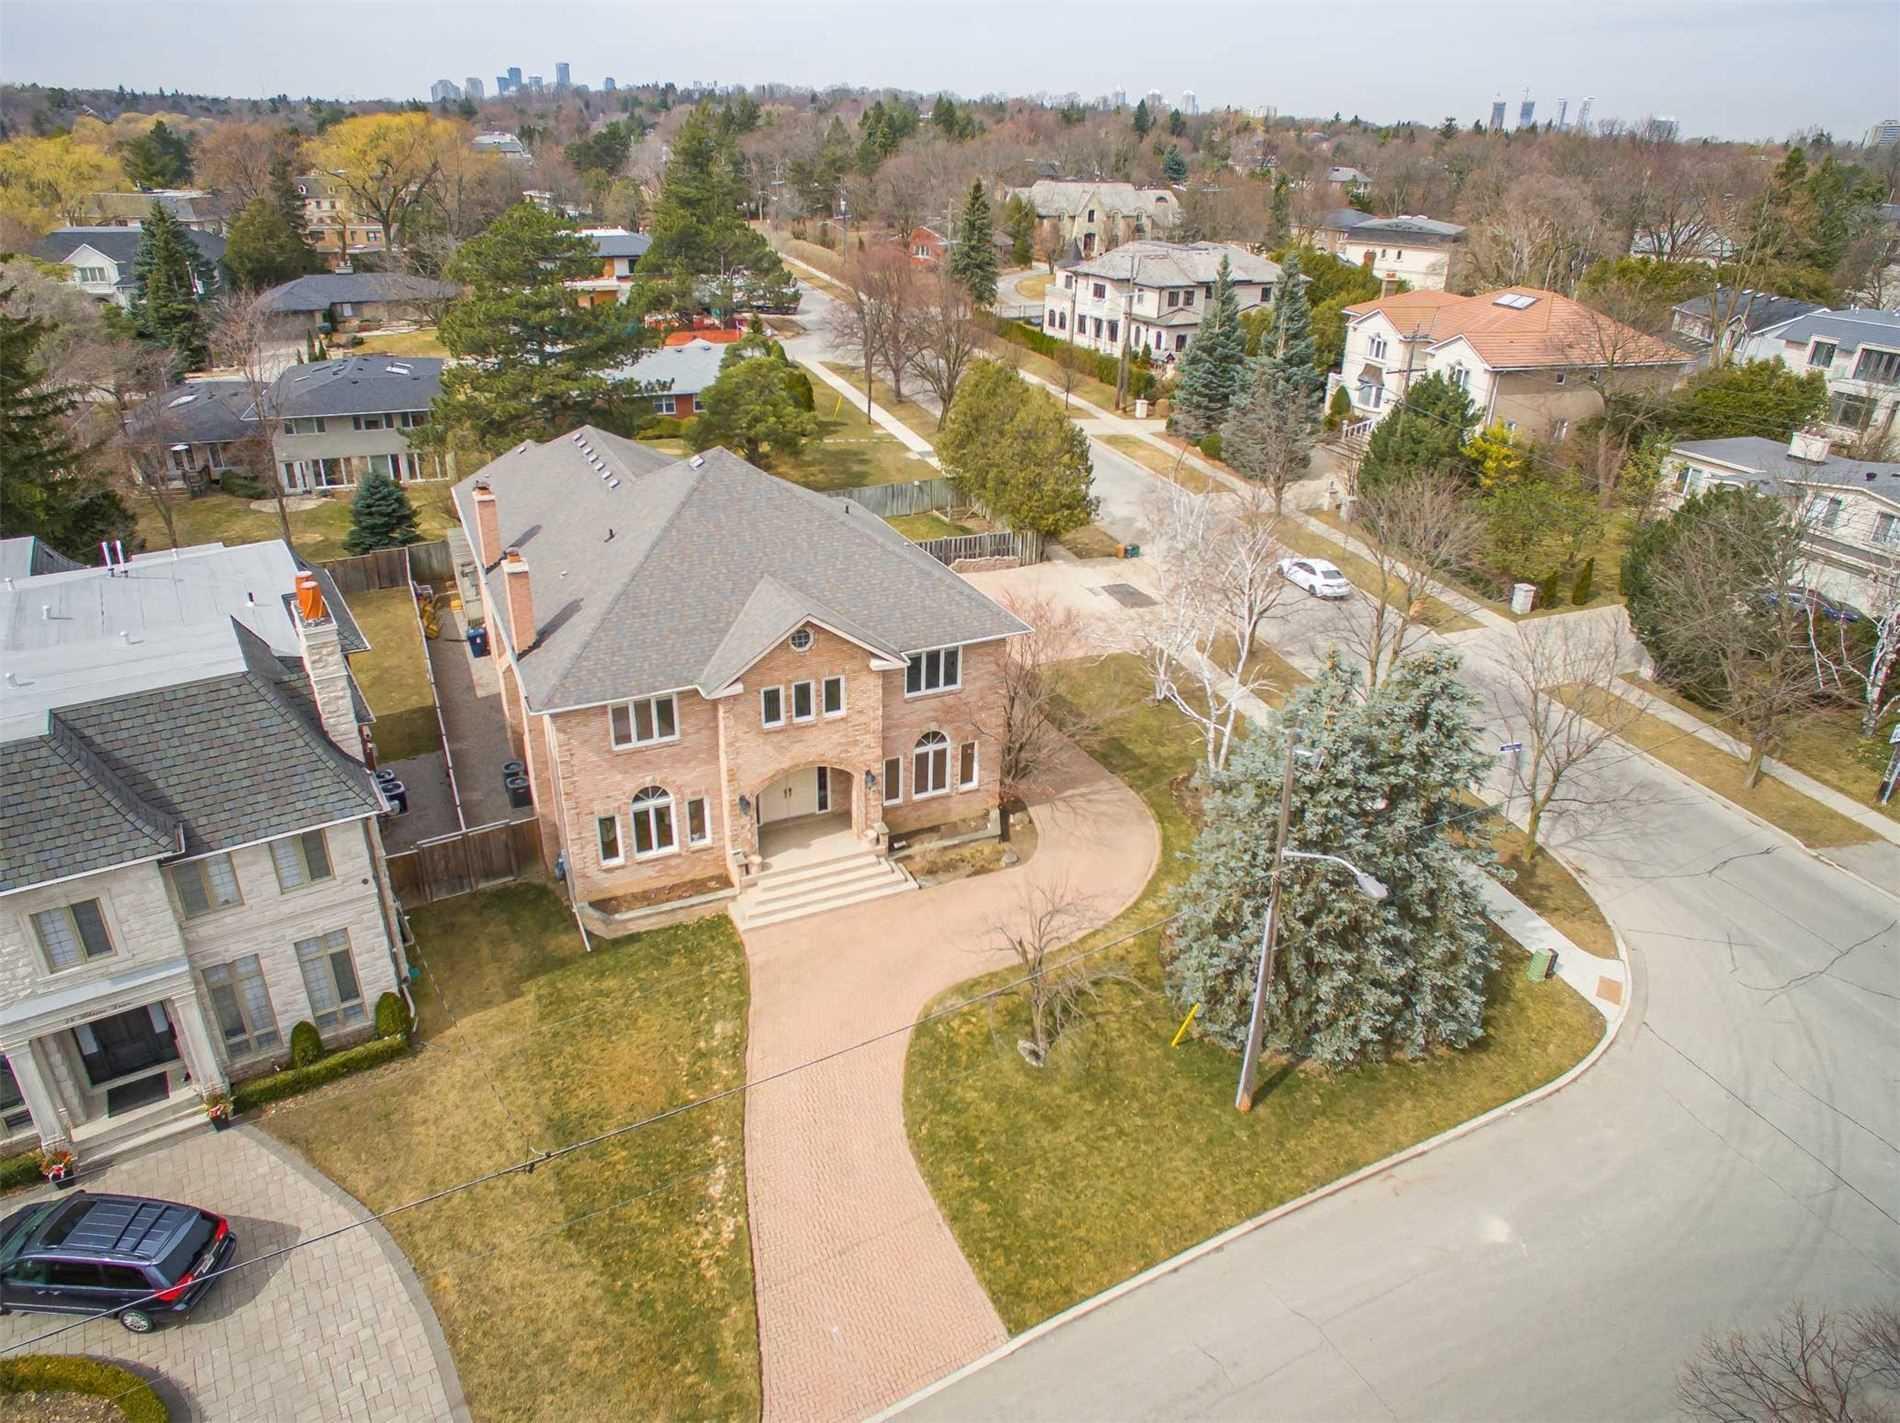 20 Blaine Dr, Toronto, Ontario M3B 2G4, 5 Bedrooms Bedrooms, 11 Rooms Rooms,5 BathroomsBathrooms,Detached,For Sale,Blaine,C5169039